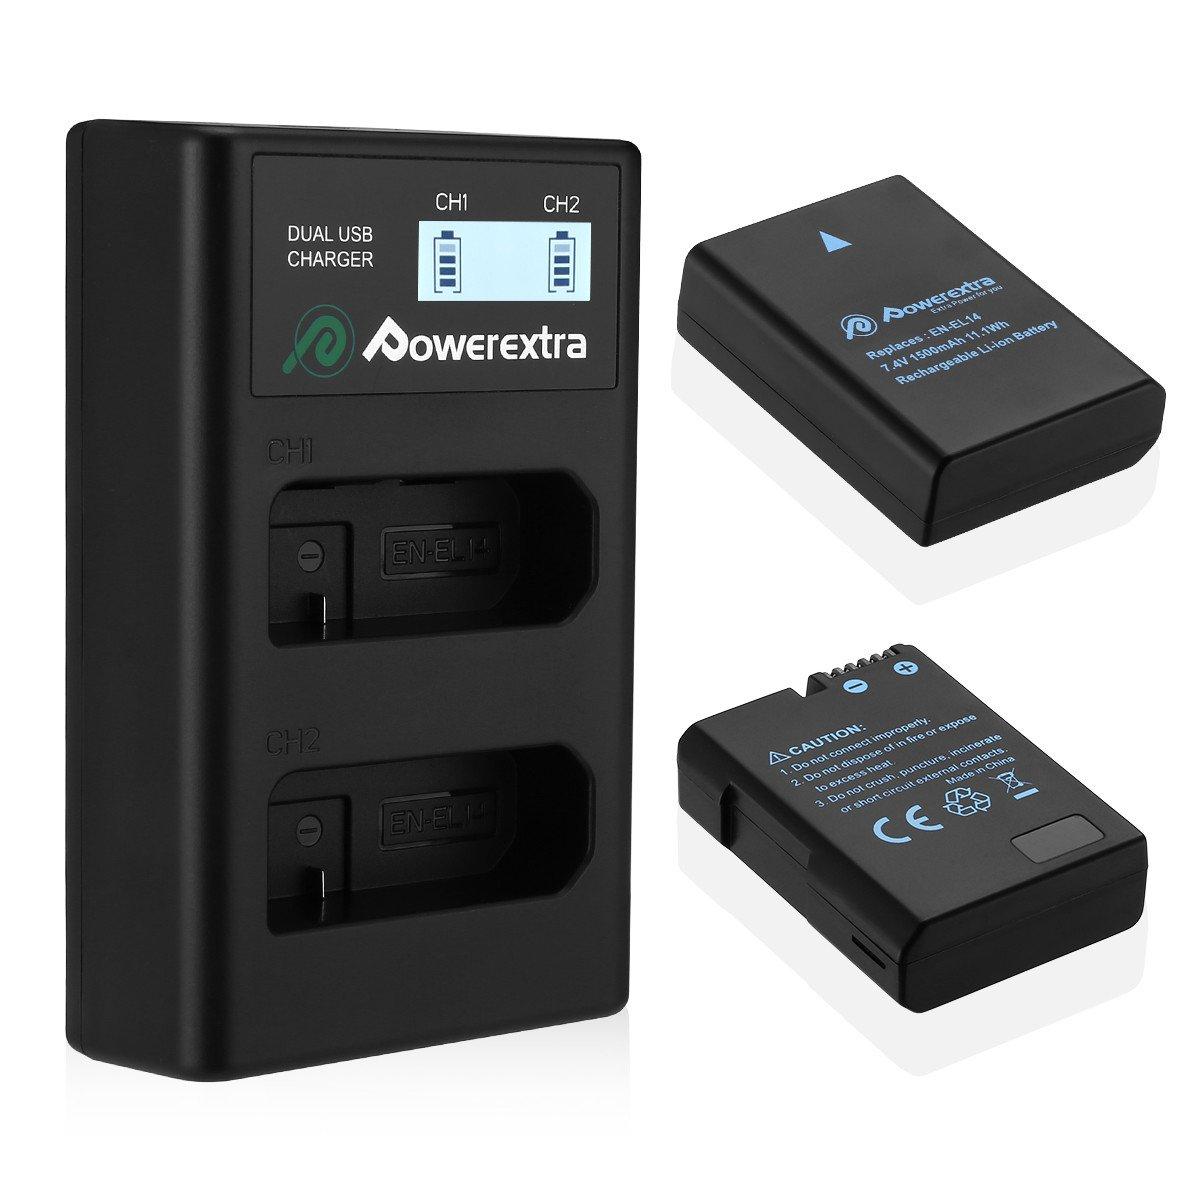 Powerextra Caricabatteria e 2x Batteria EN-EL14 EN-EL14a, Batterie e Doppio Caricatore LCD Rapido per Nikon D3100 | D3200 | D3300 | D3400 | D5100 | D5200 | D5300 | D5500 | D5600 | Df | P7000 | P7100 | P7700 | P7800